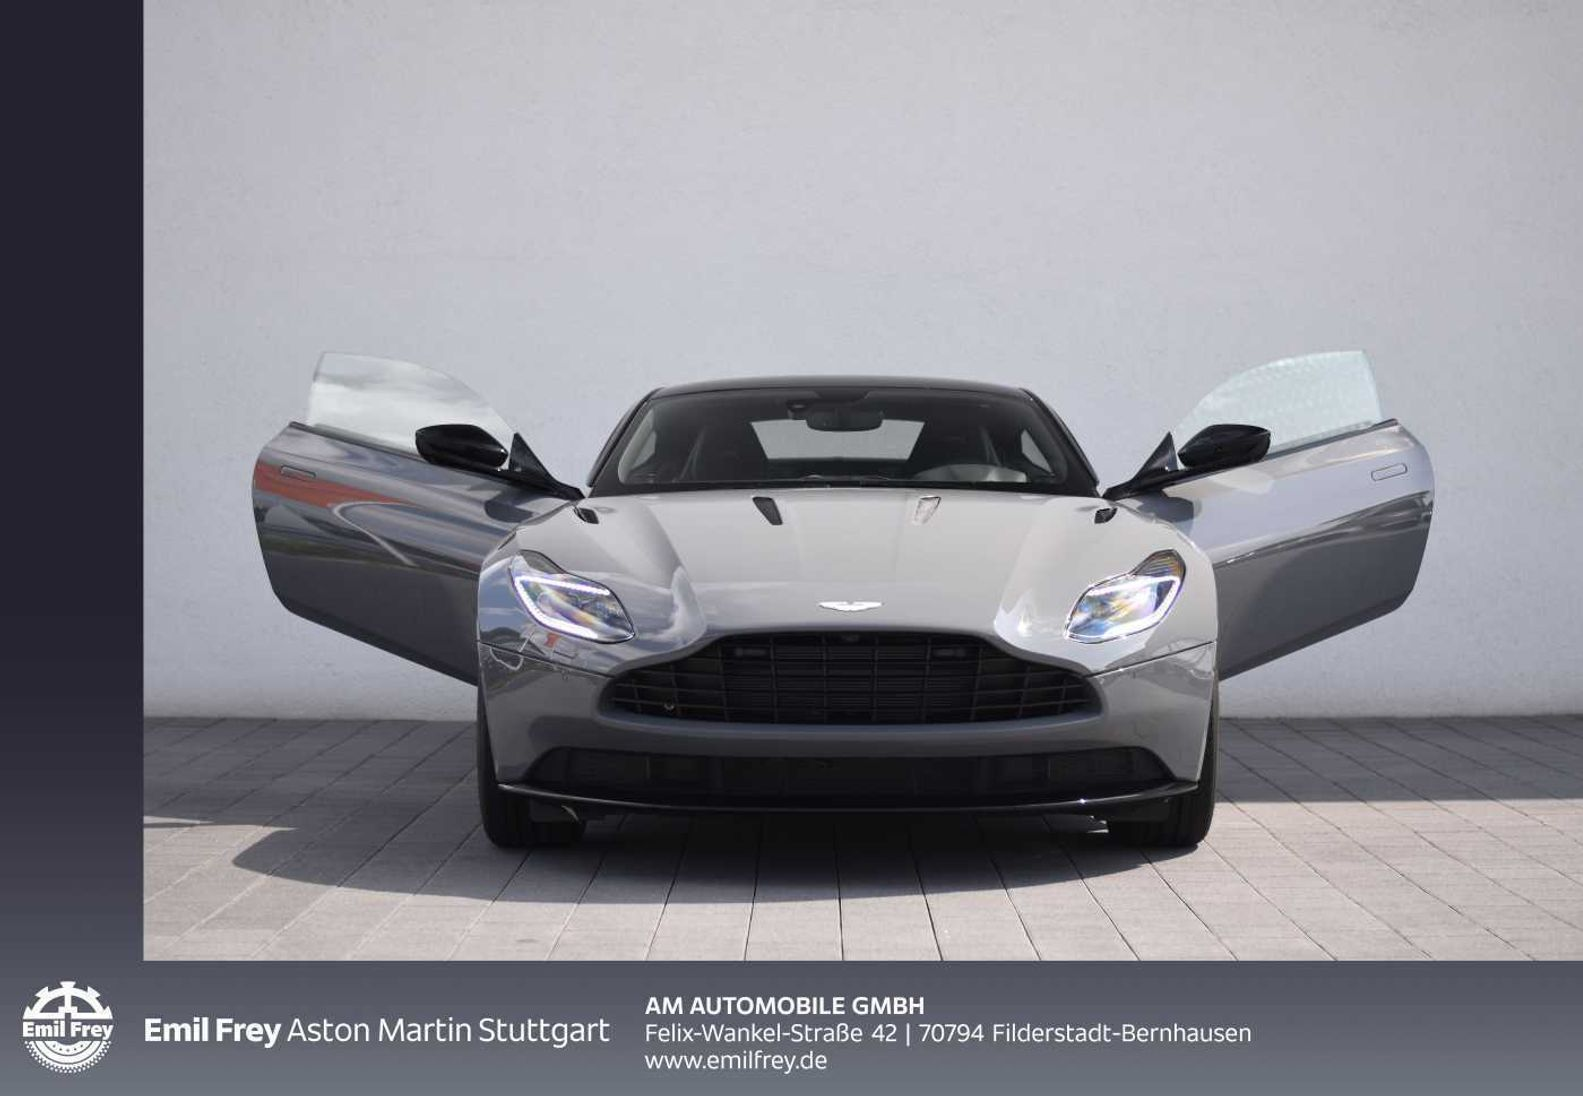 Aston Martin Db11 V12 Amr 470 Kw Carvago Com